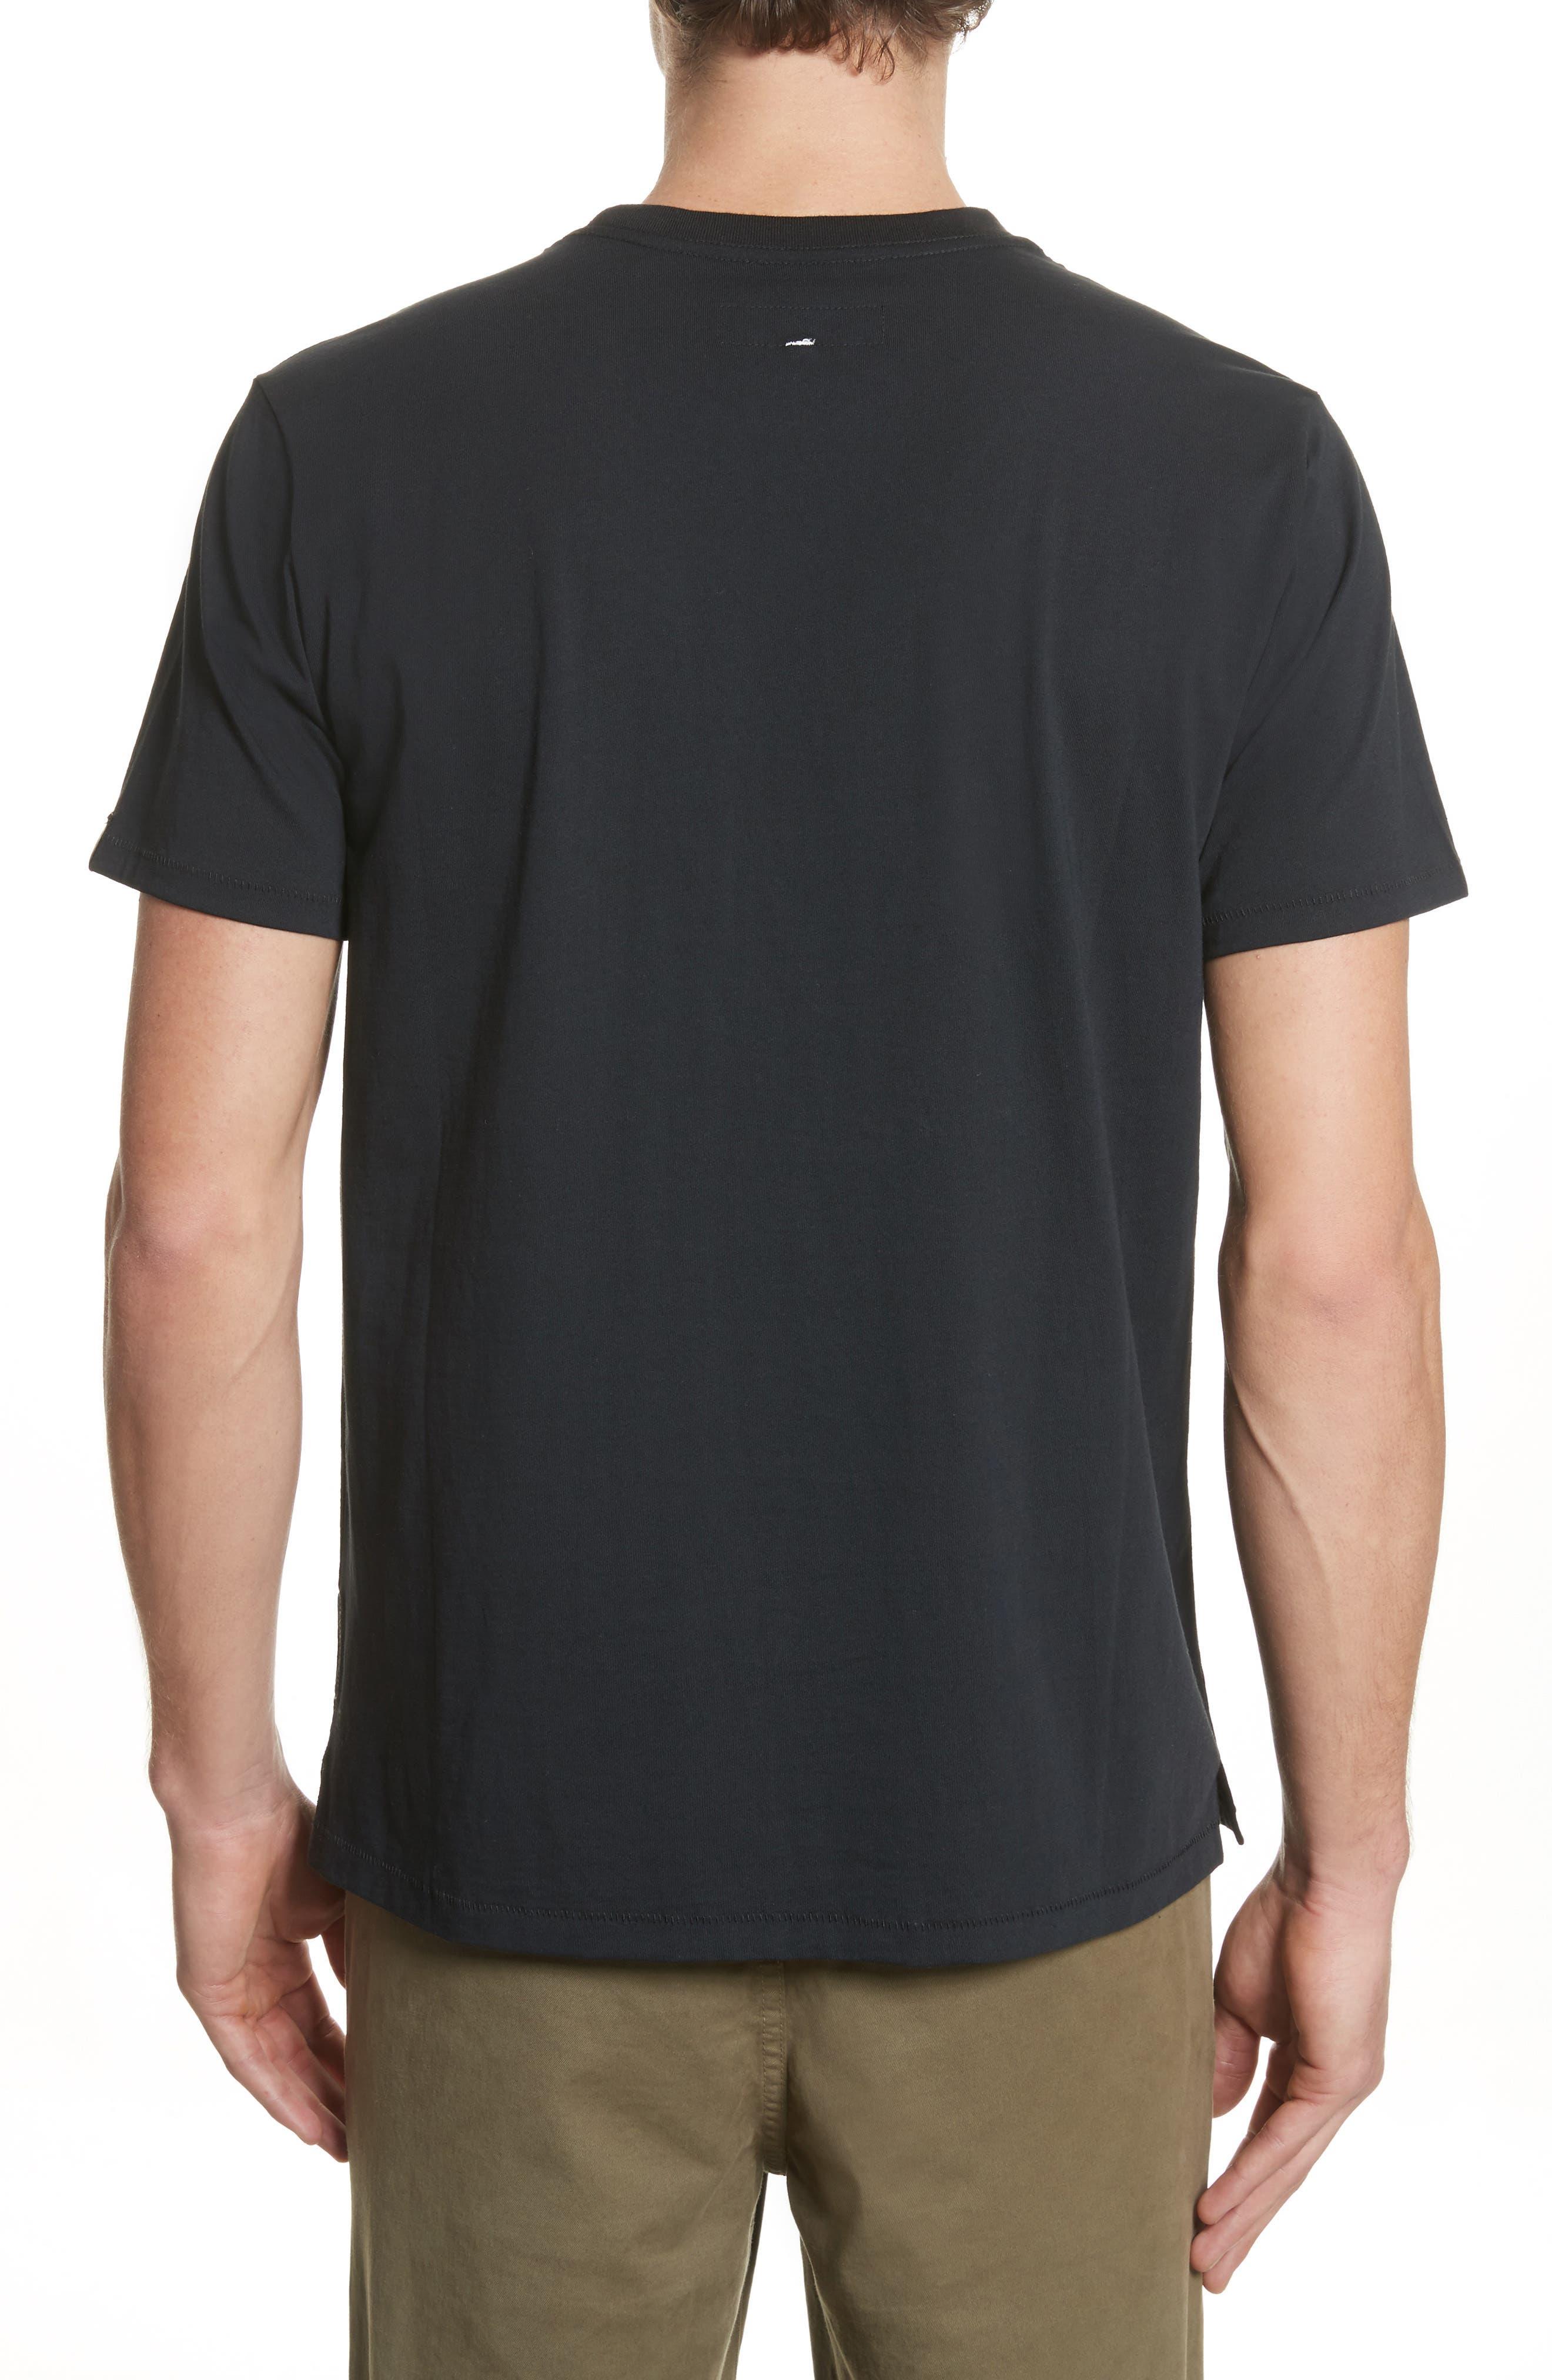 Japan Graphic T-Shirt,                             Alternate thumbnail 2, color,                             Black